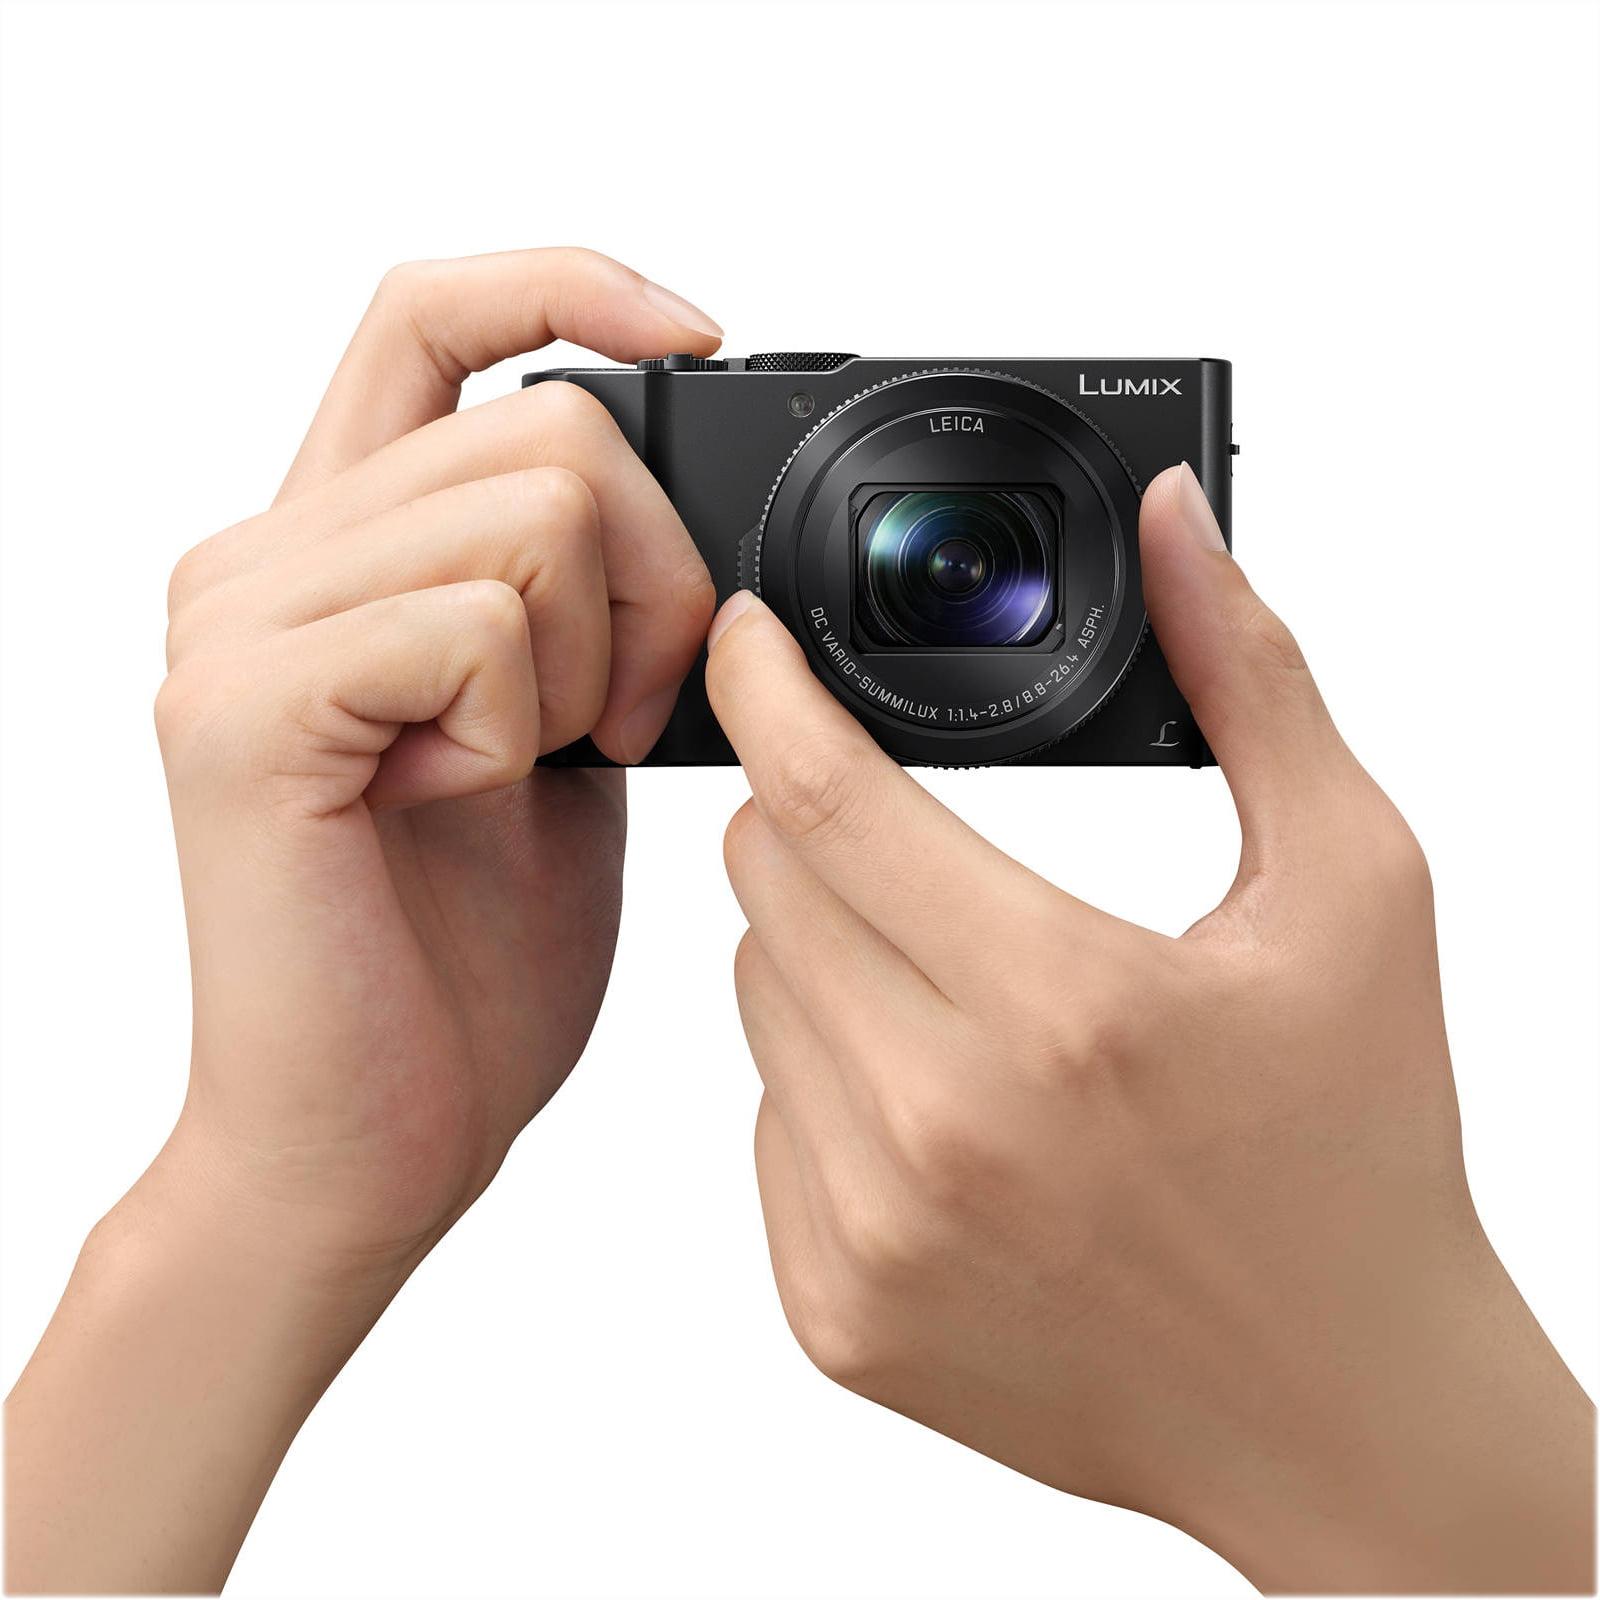 Panasonic Lumix Dmc Lx10 Digital Camera Lx10k Black